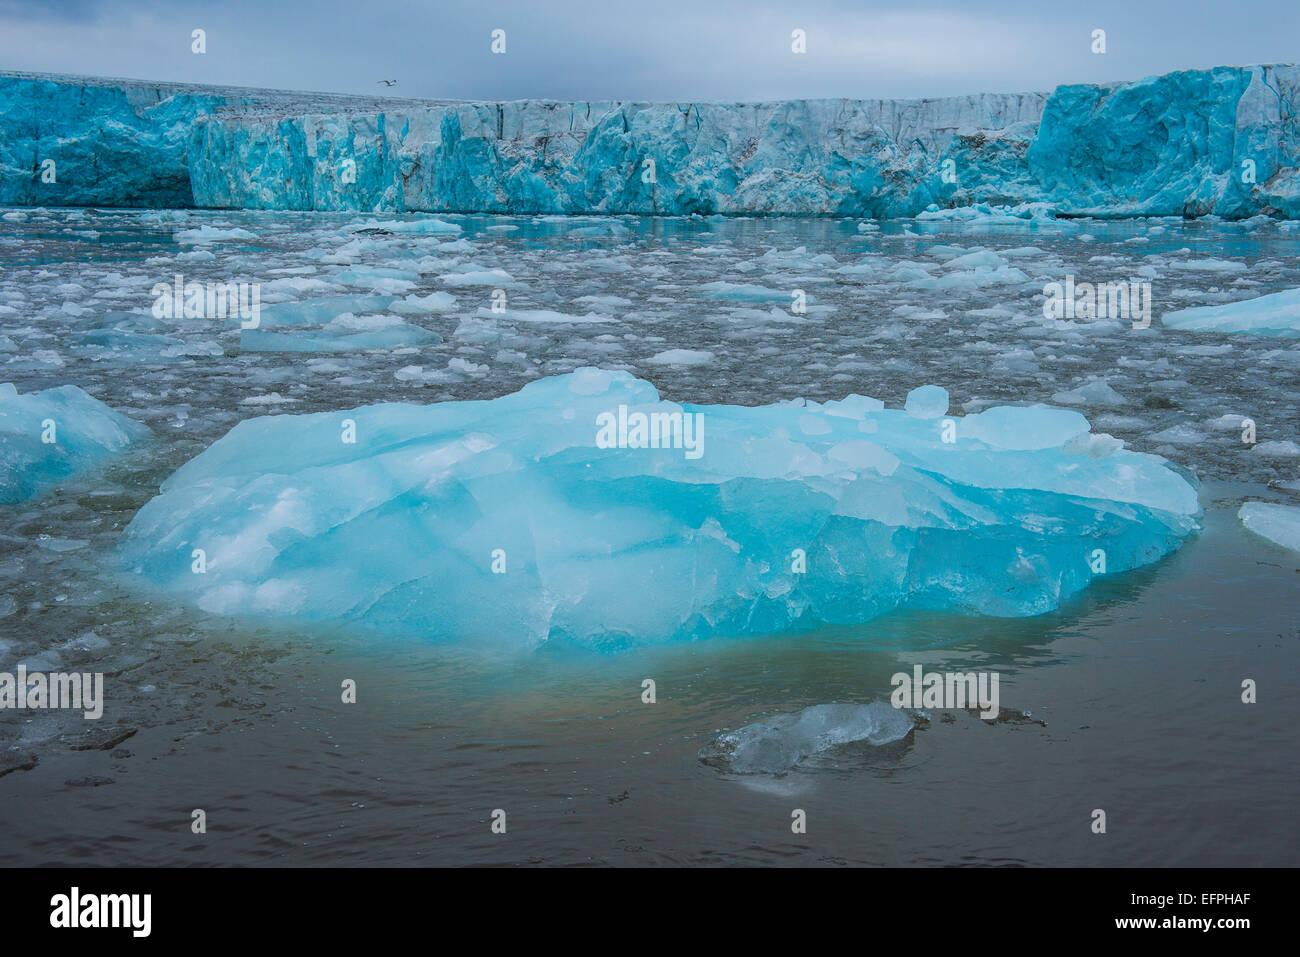 Shining blue glacier ice, Hornsund, Svalbard, Arctic, Norway, Scandinavia, Europe - Stock Image